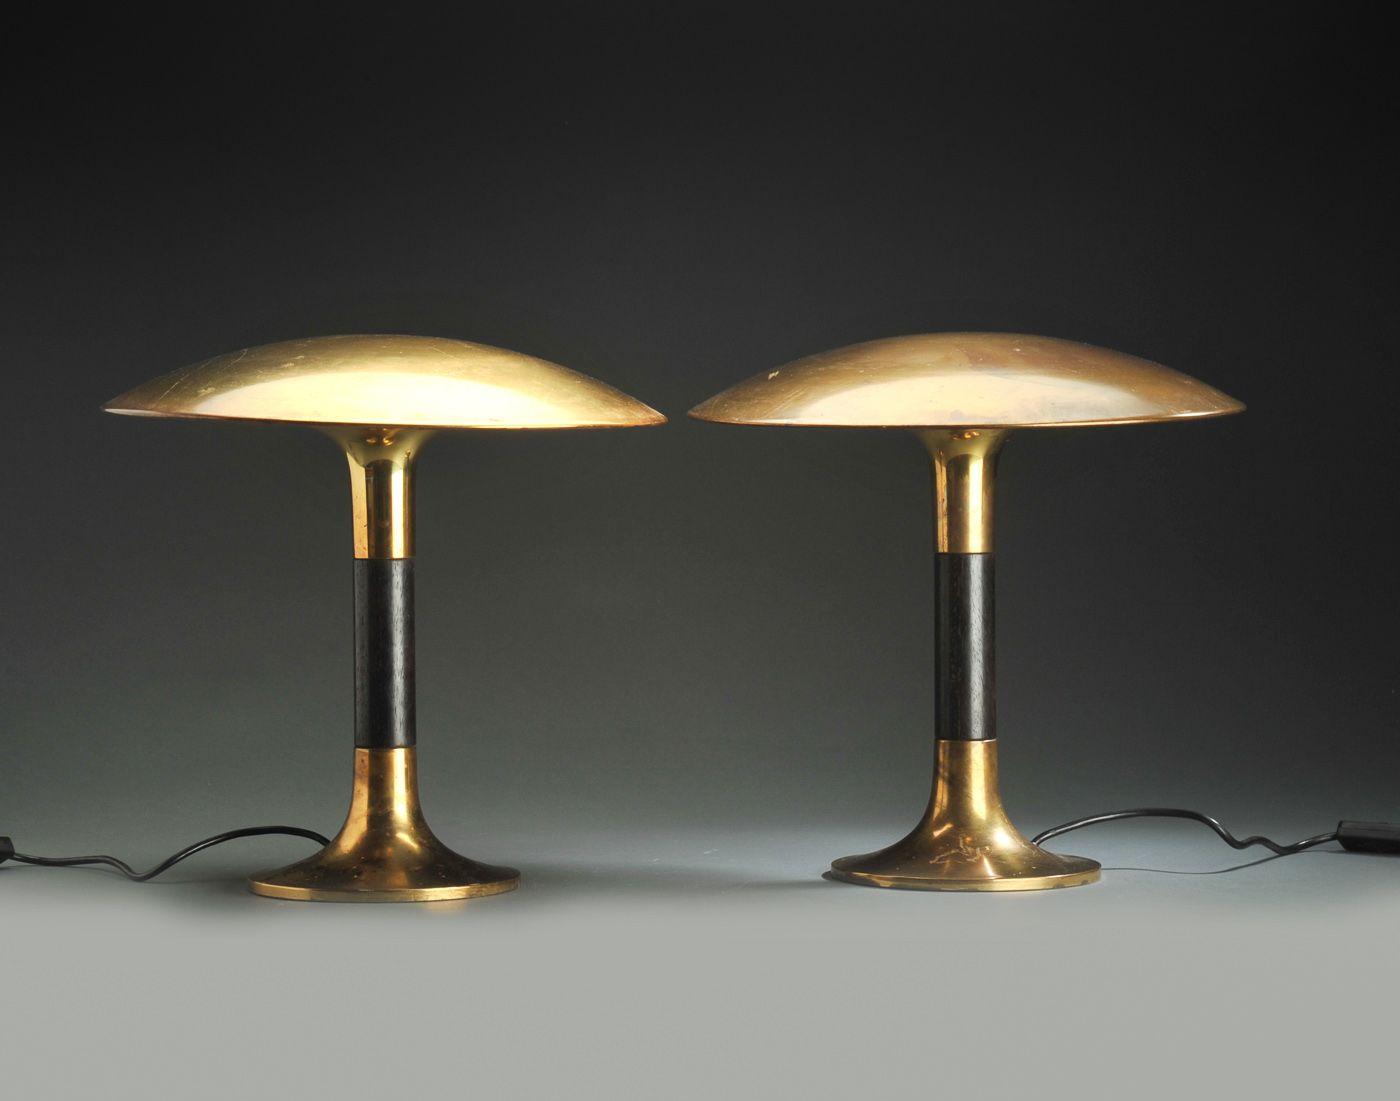 art deco table lamps 1930s art dec pinterest art deco table rh pinterest com